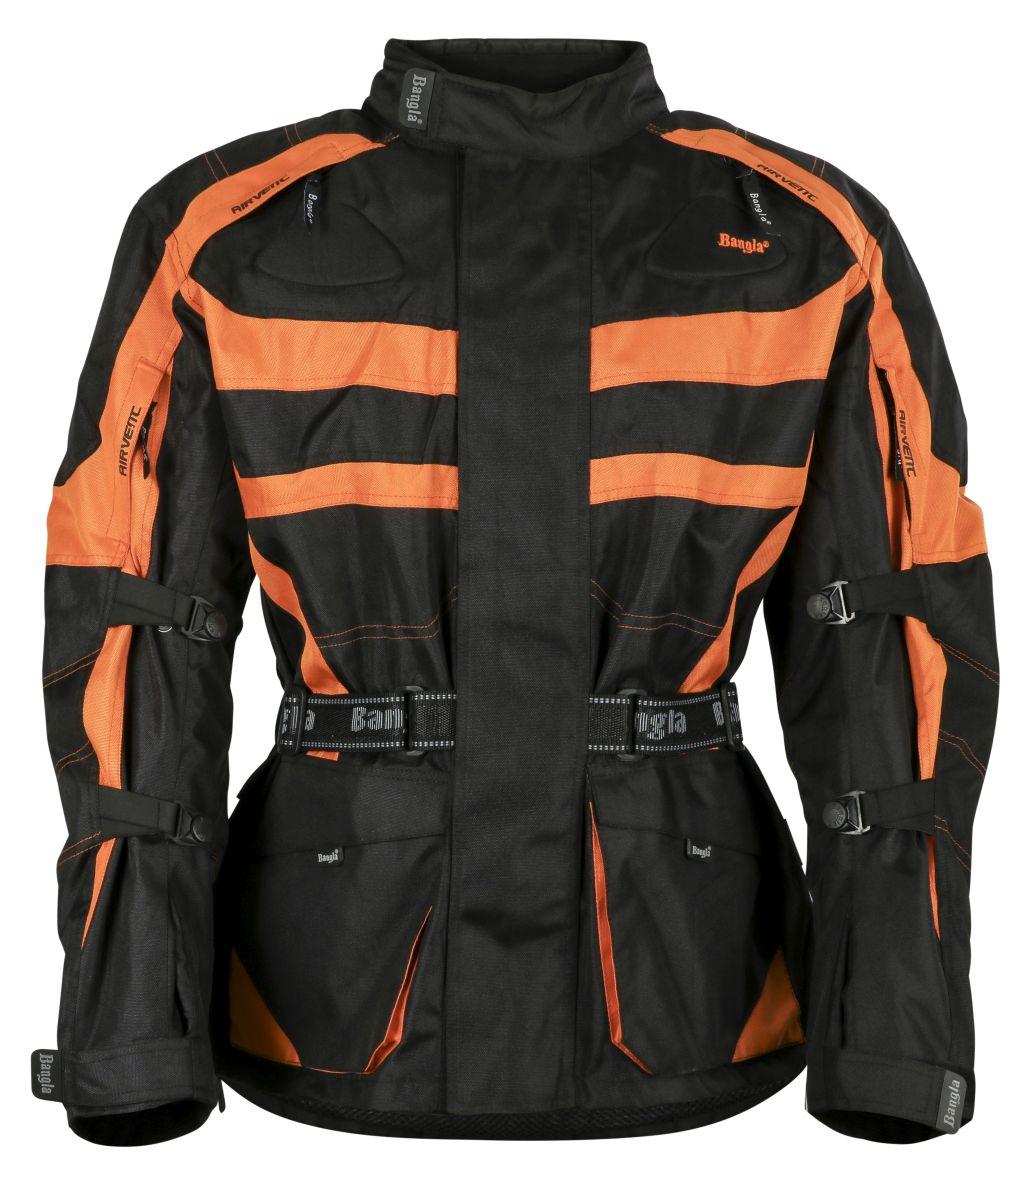 Bangla Motorrad Textil Jacke Cordura Schwarz orange Motorradjacke M - 6 XL